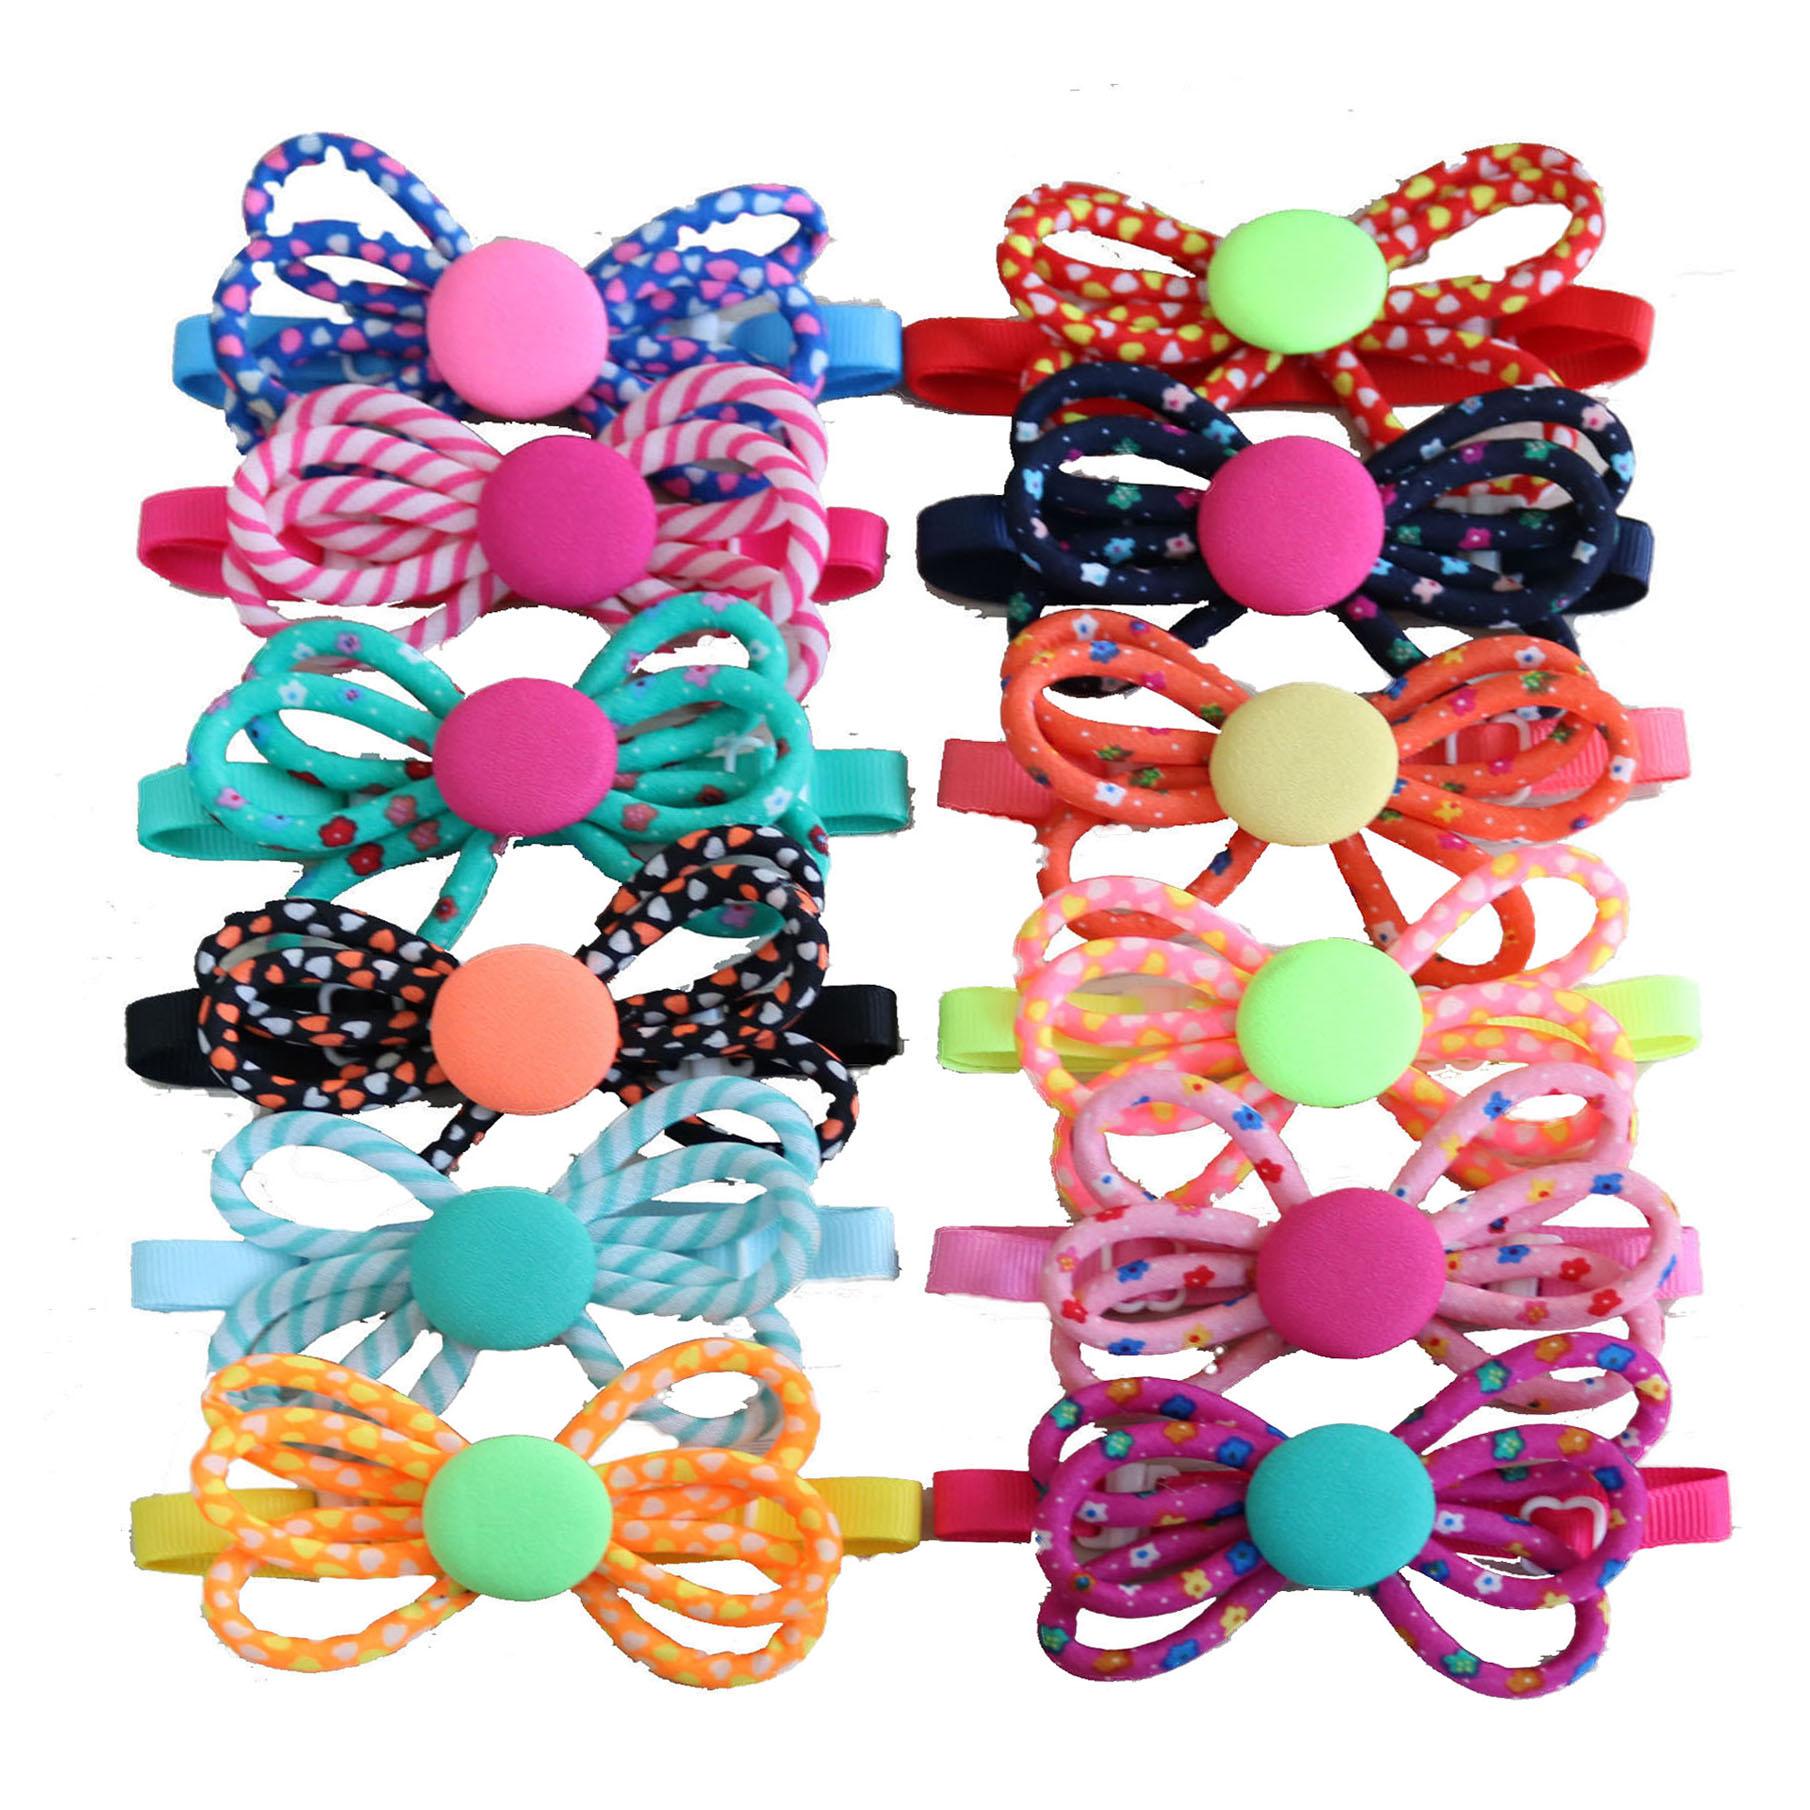 100pcs Pet Bow Tie Dog Accessories Hand made Adjustable Pet Dog Cat Bowties Collar Pet Decoration